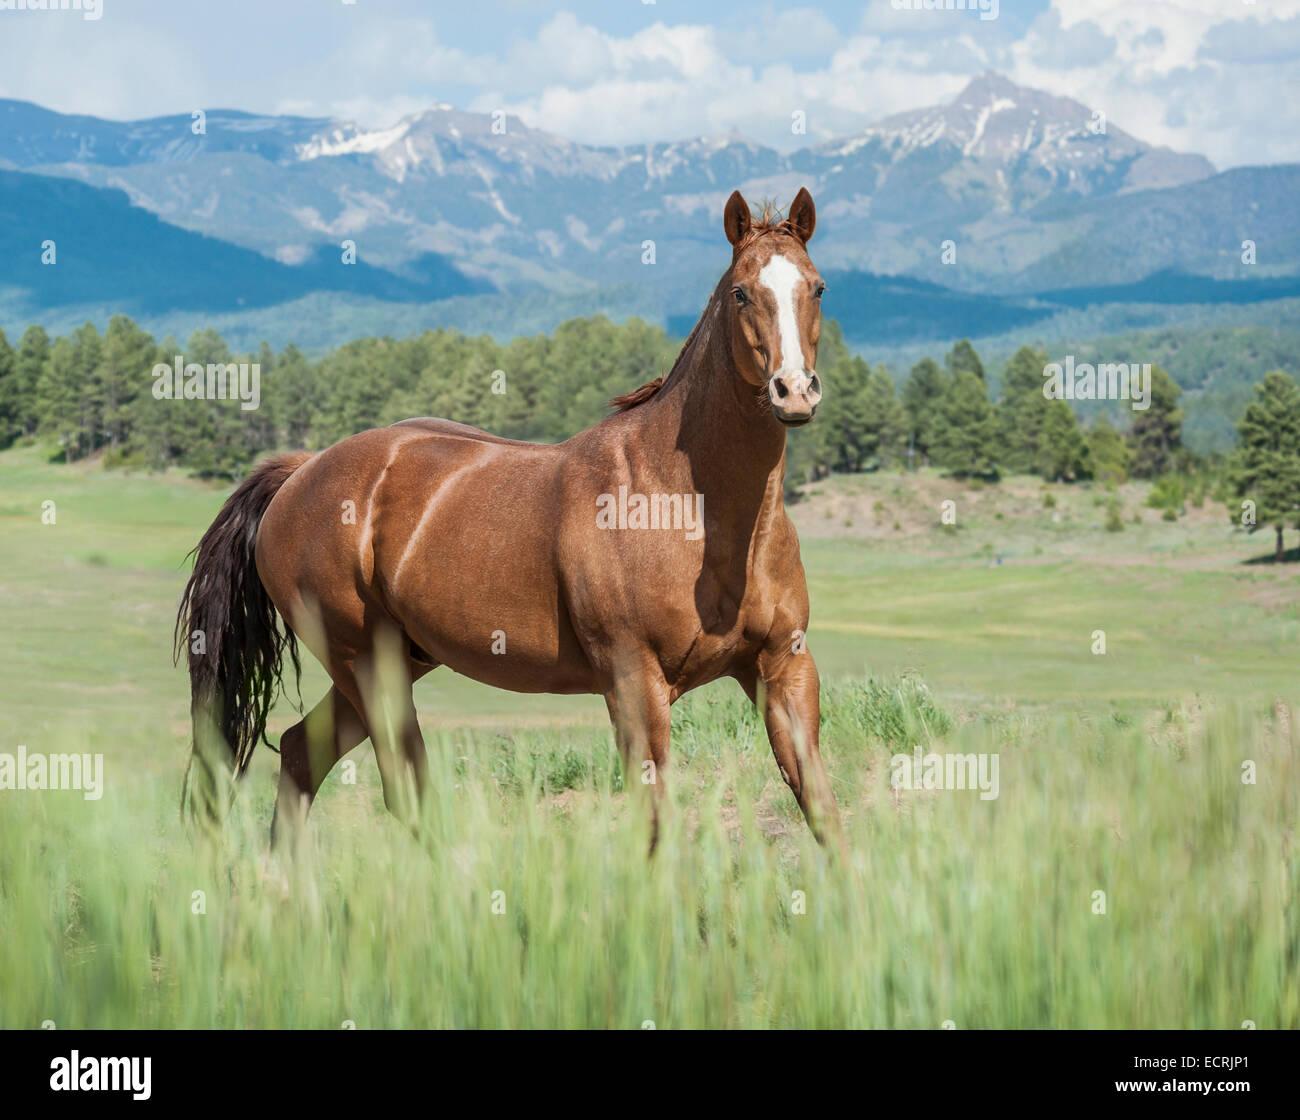 Quarter Horse stallion - Stock Image